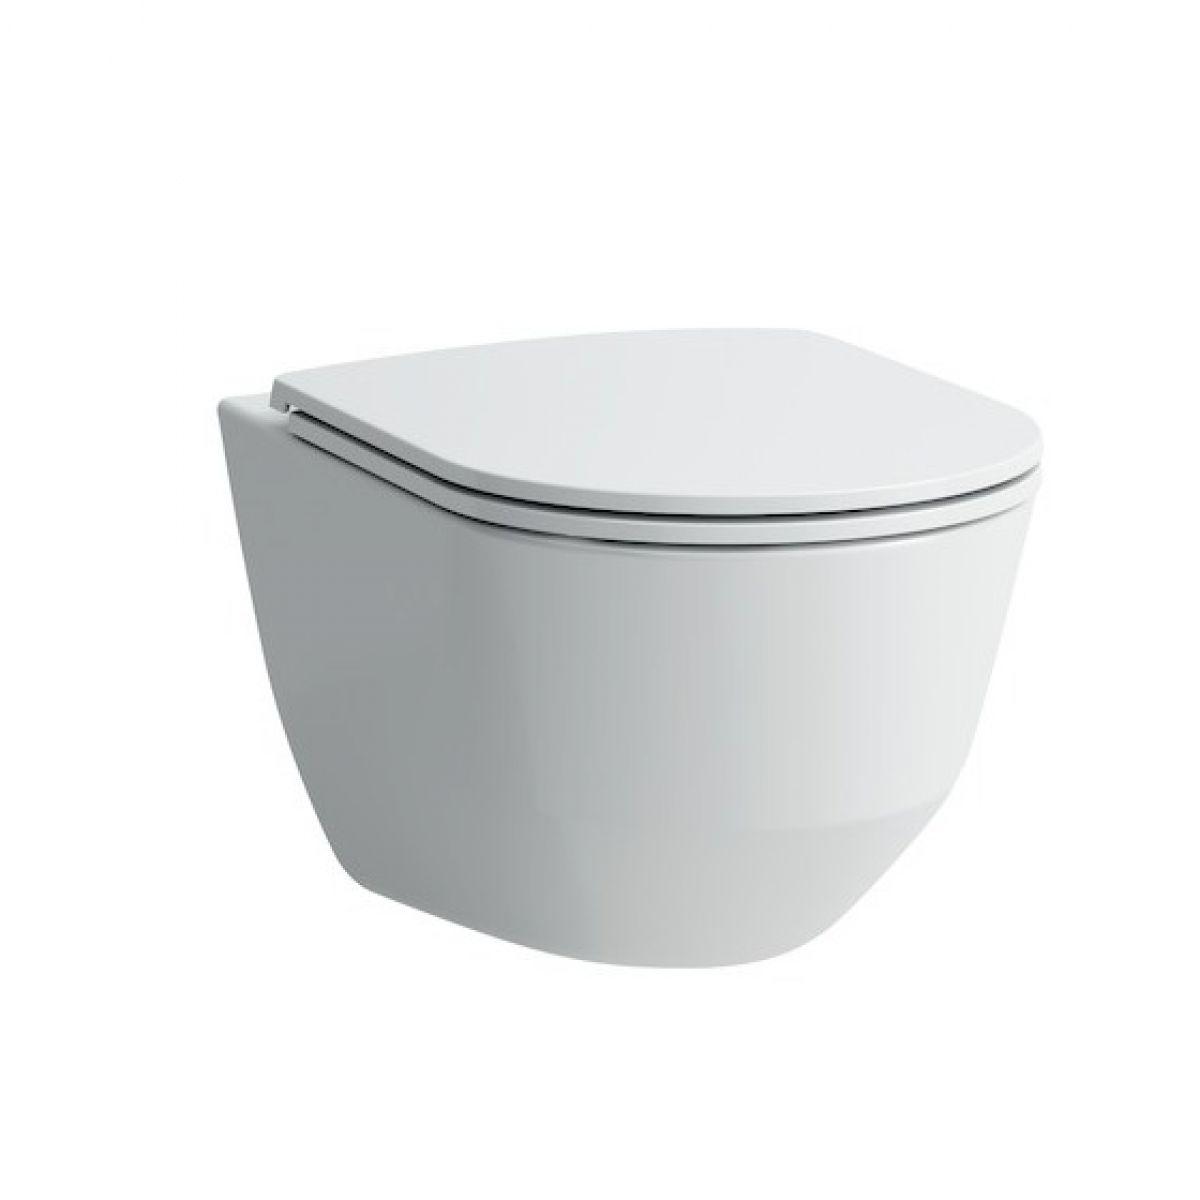 laufen pro wall hung rimless toilet uk bathrooms. Black Bedroom Furniture Sets. Home Design Ideas